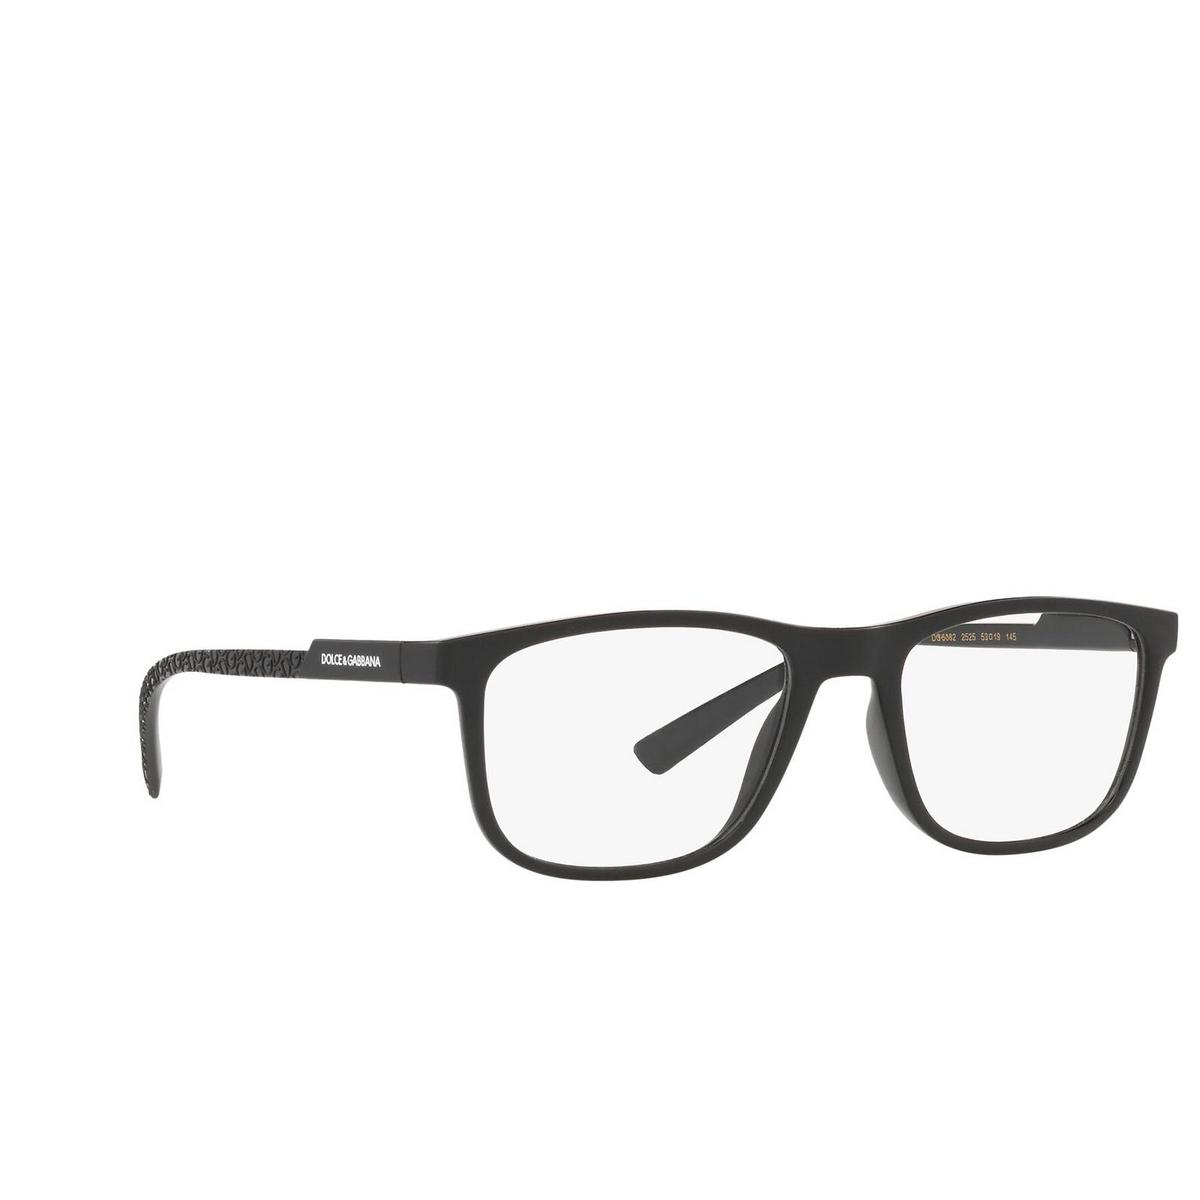 Dolce & Gabbana® Rectangle Eyeglasses: DG5062 color Black 2525 - three-quarters view.